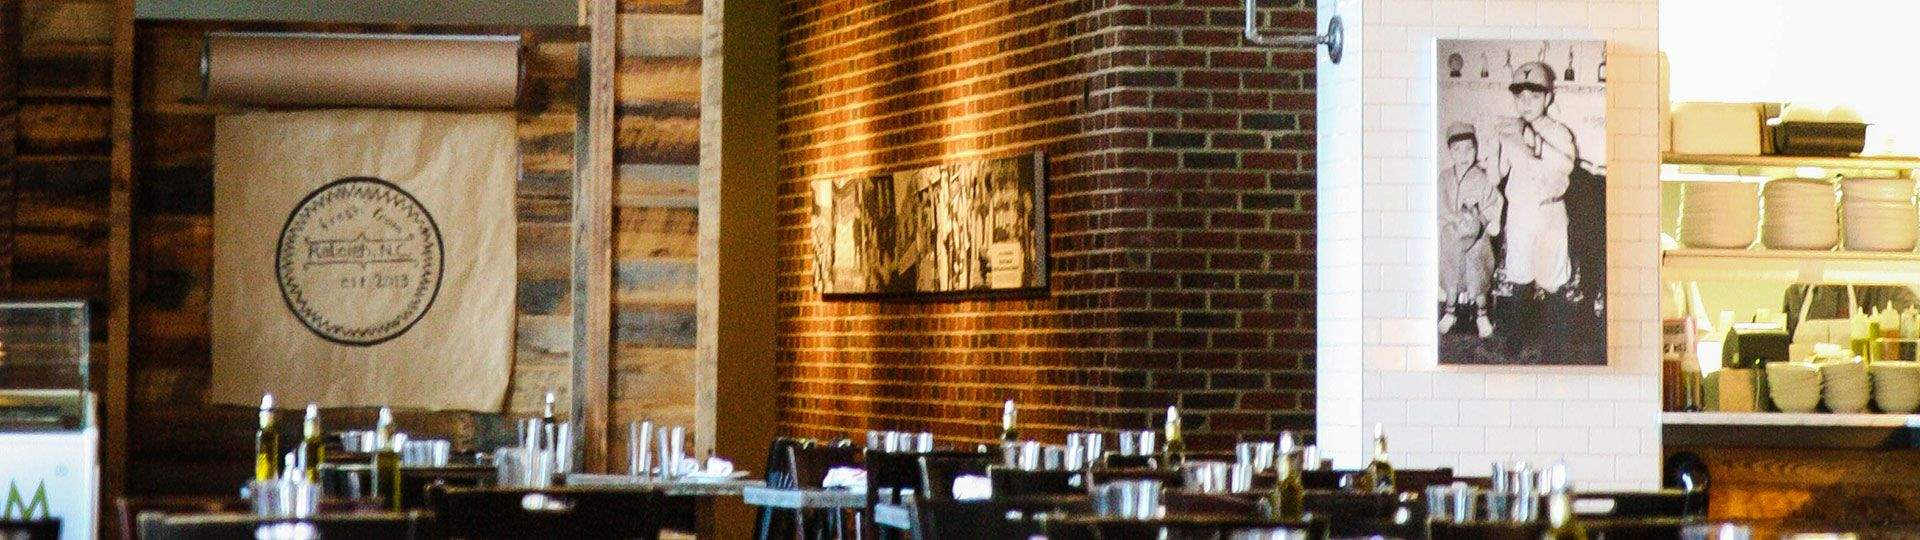 Jimmy V's Osteria + Bar, North Carolina - Site Map